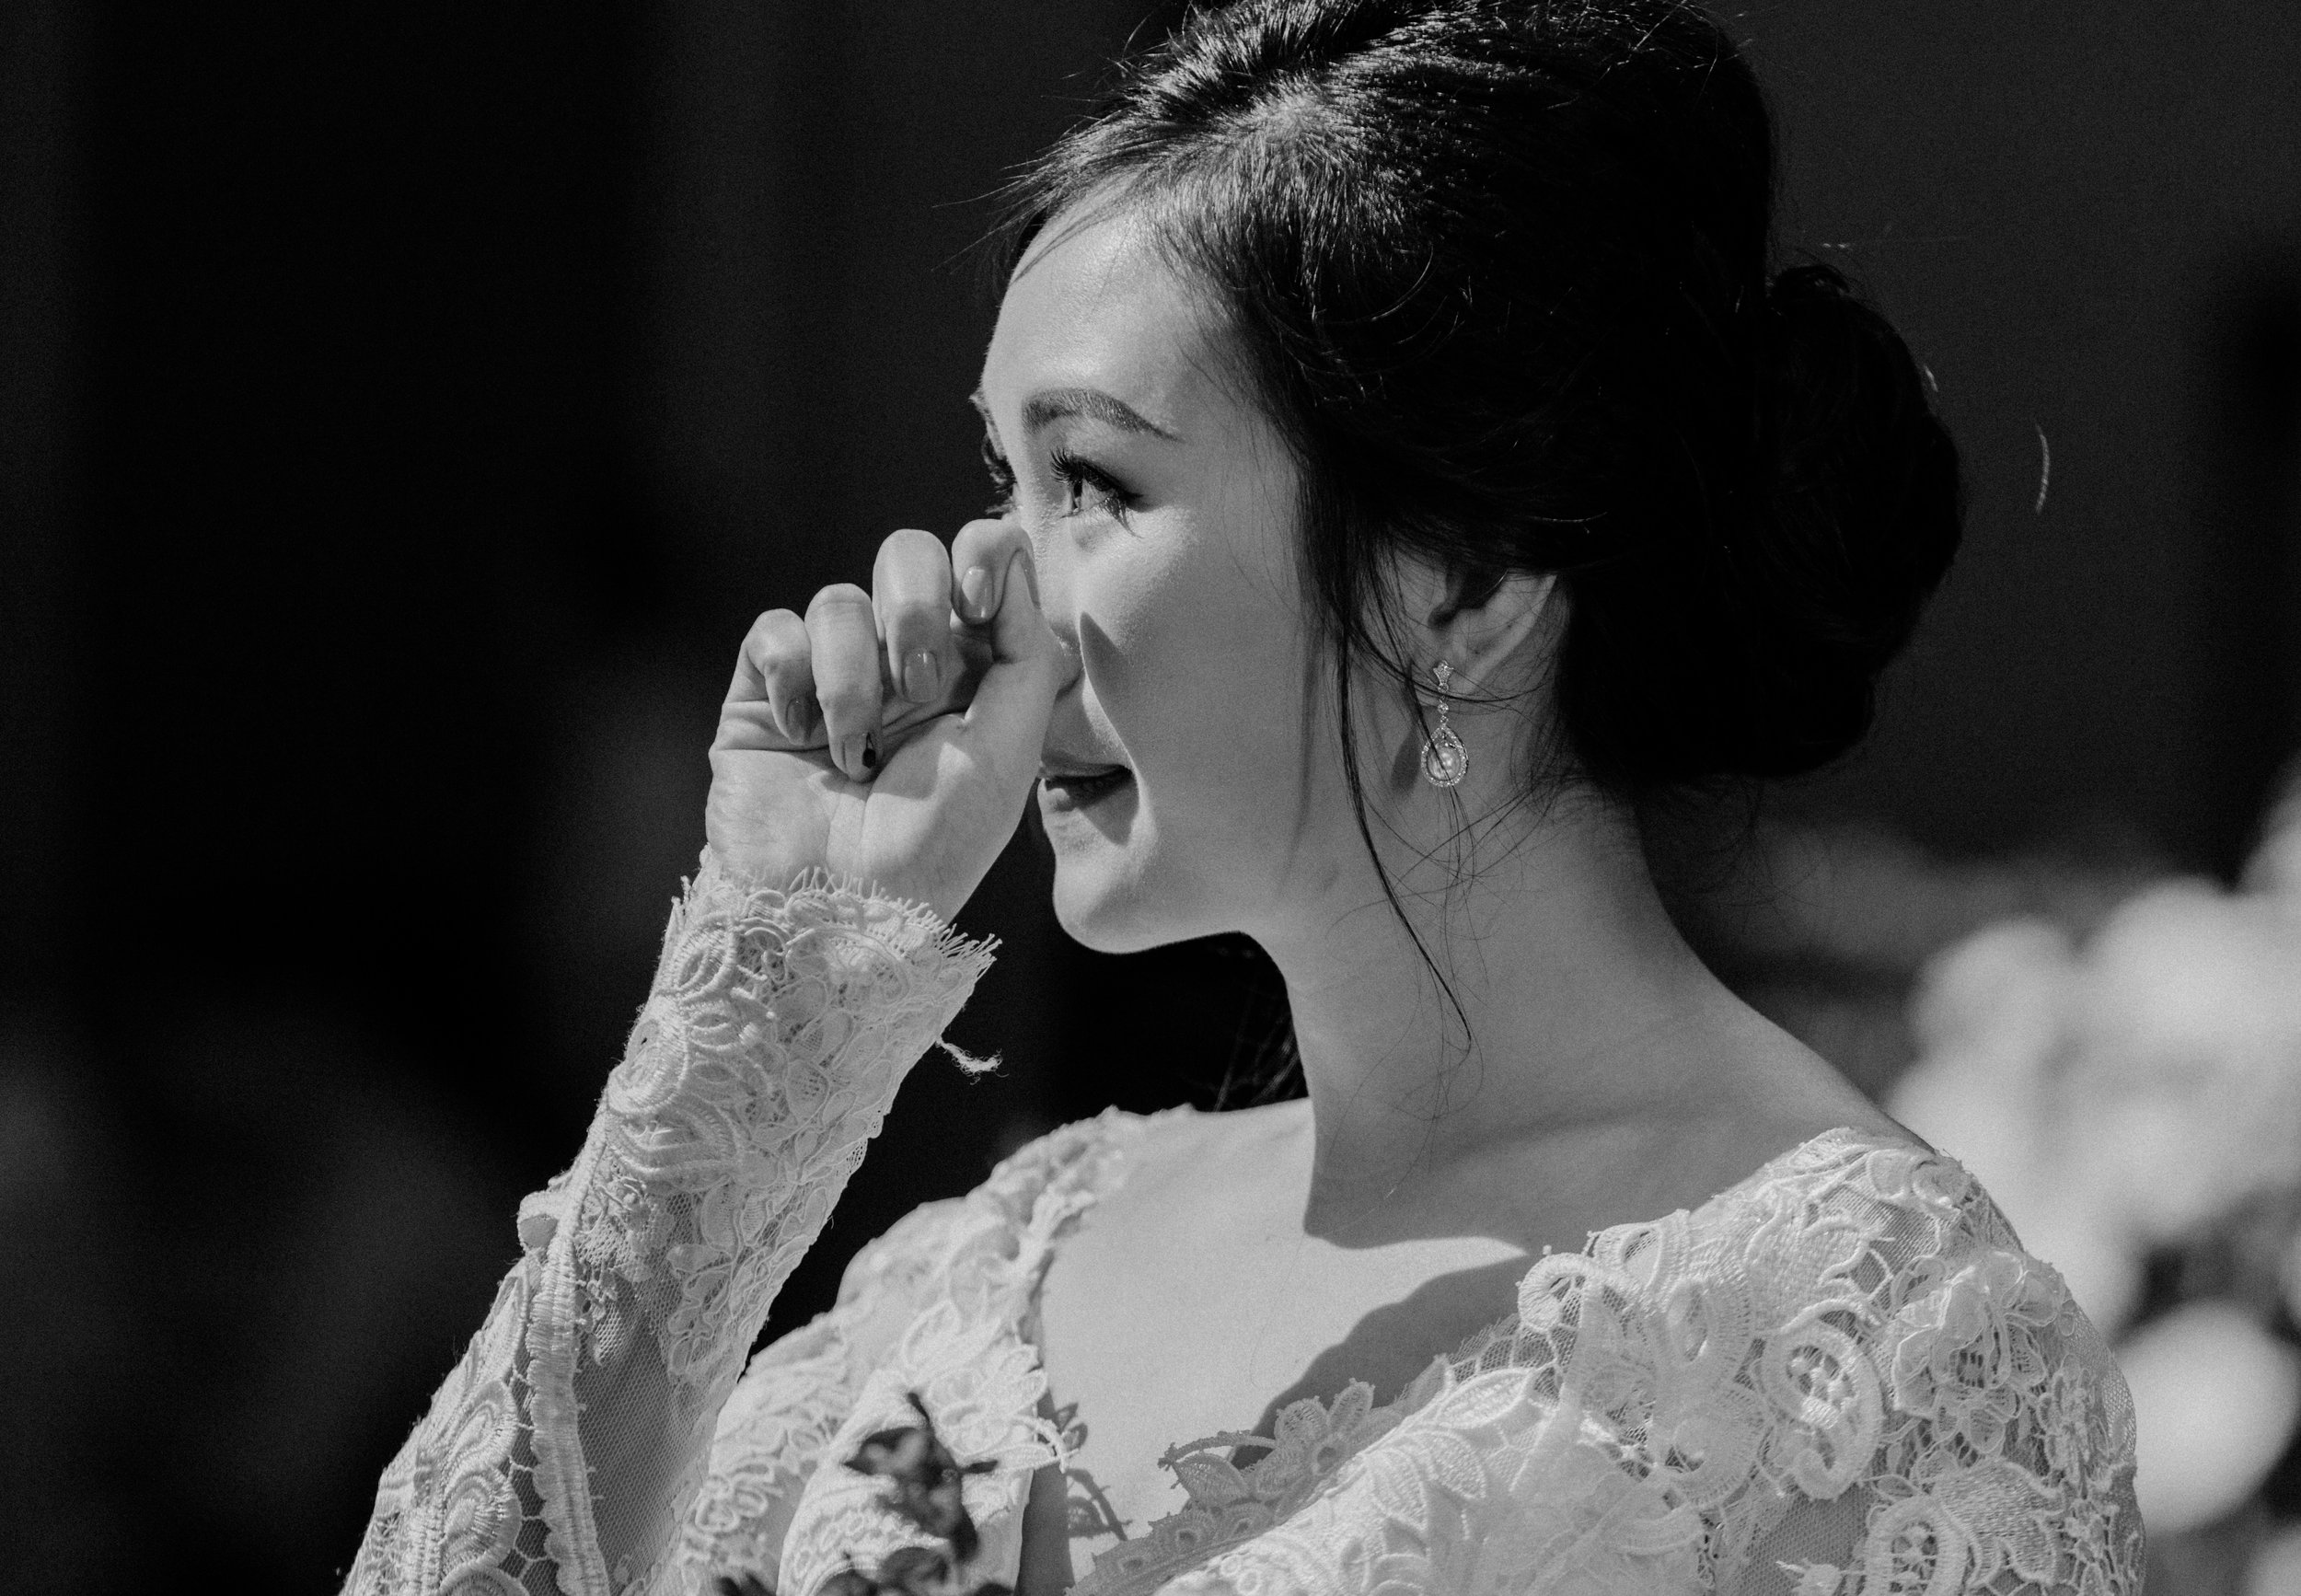 Mirrorwedding Destination Photographer TopofHanoi Duc Anh Hien Trang 184250.jpg